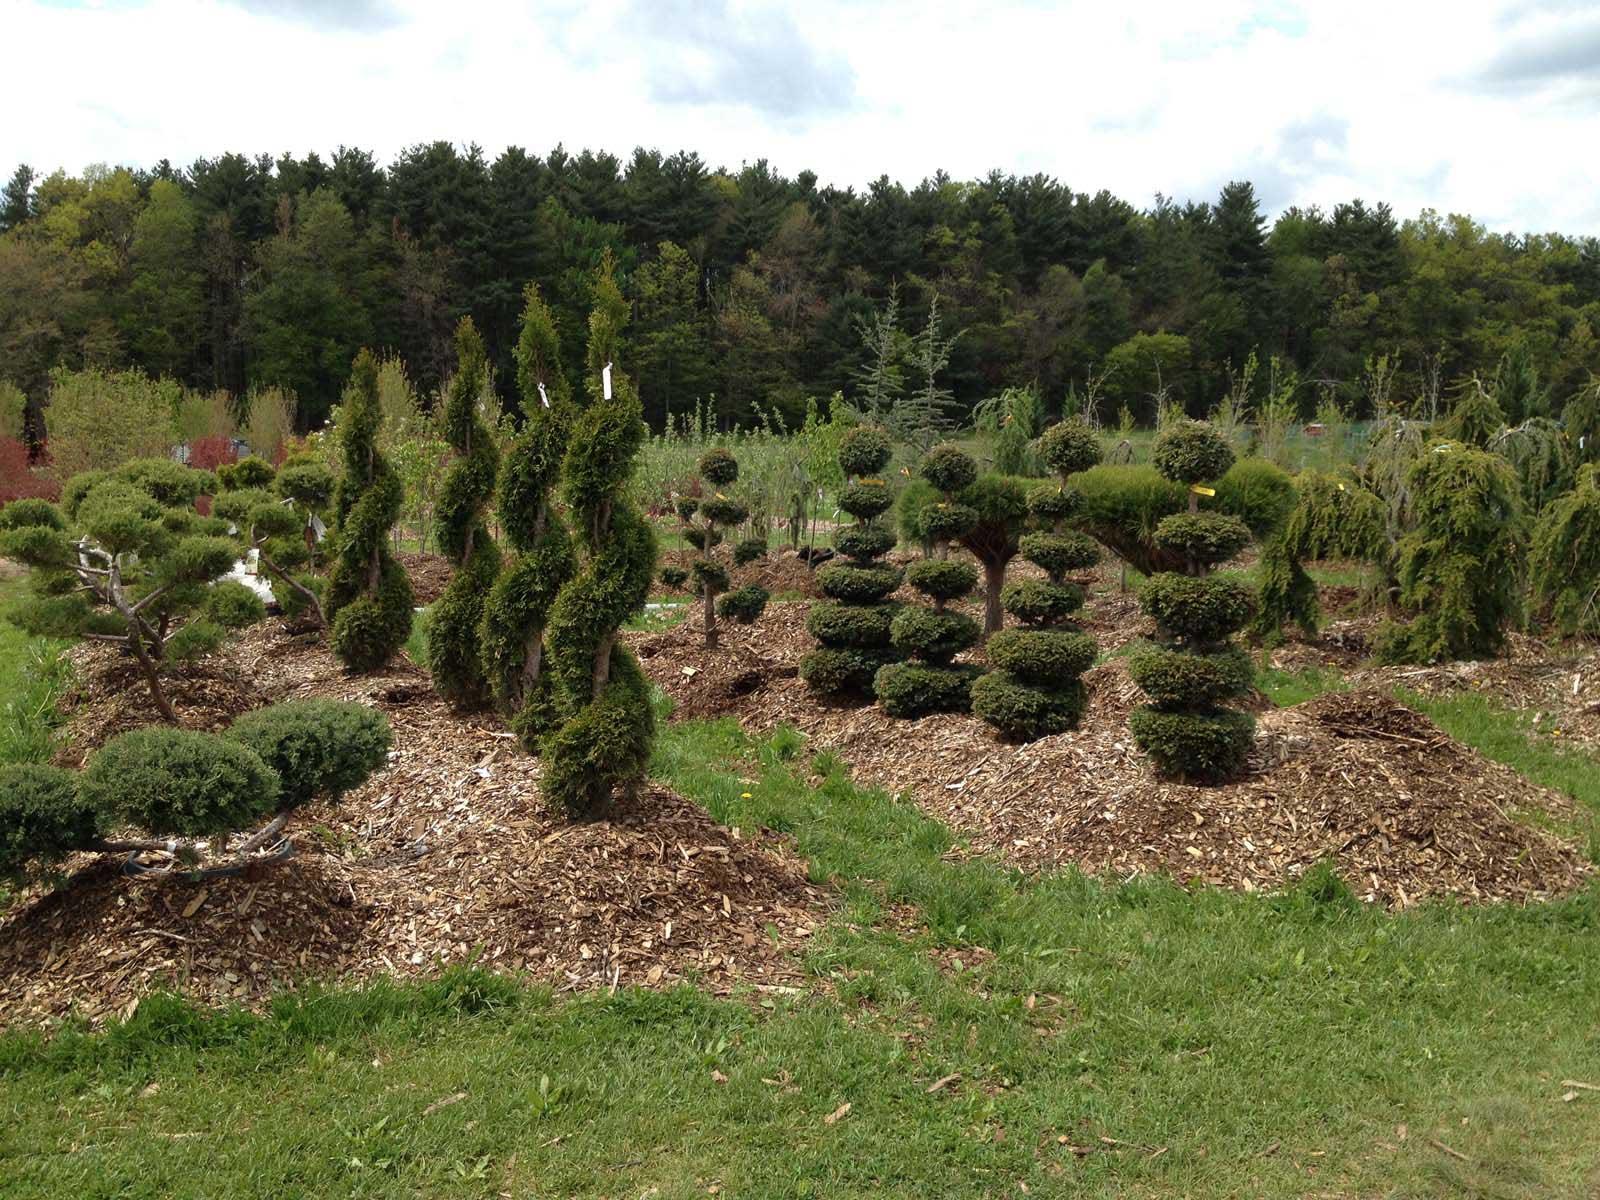 Topiaries & Ornamental Evergreens